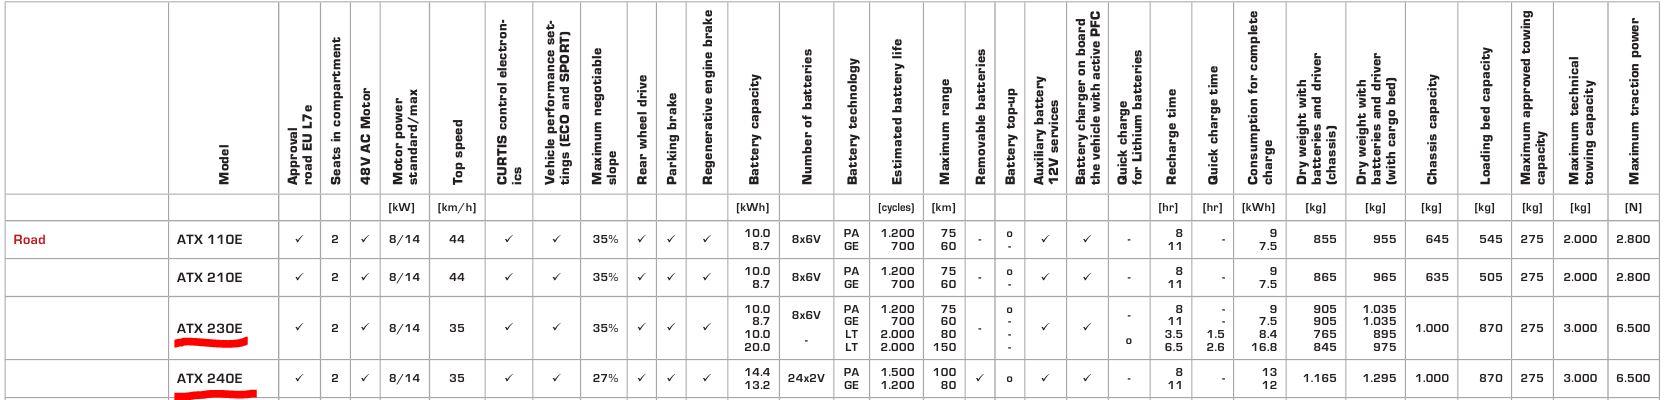 електрокари-каталог-виробника